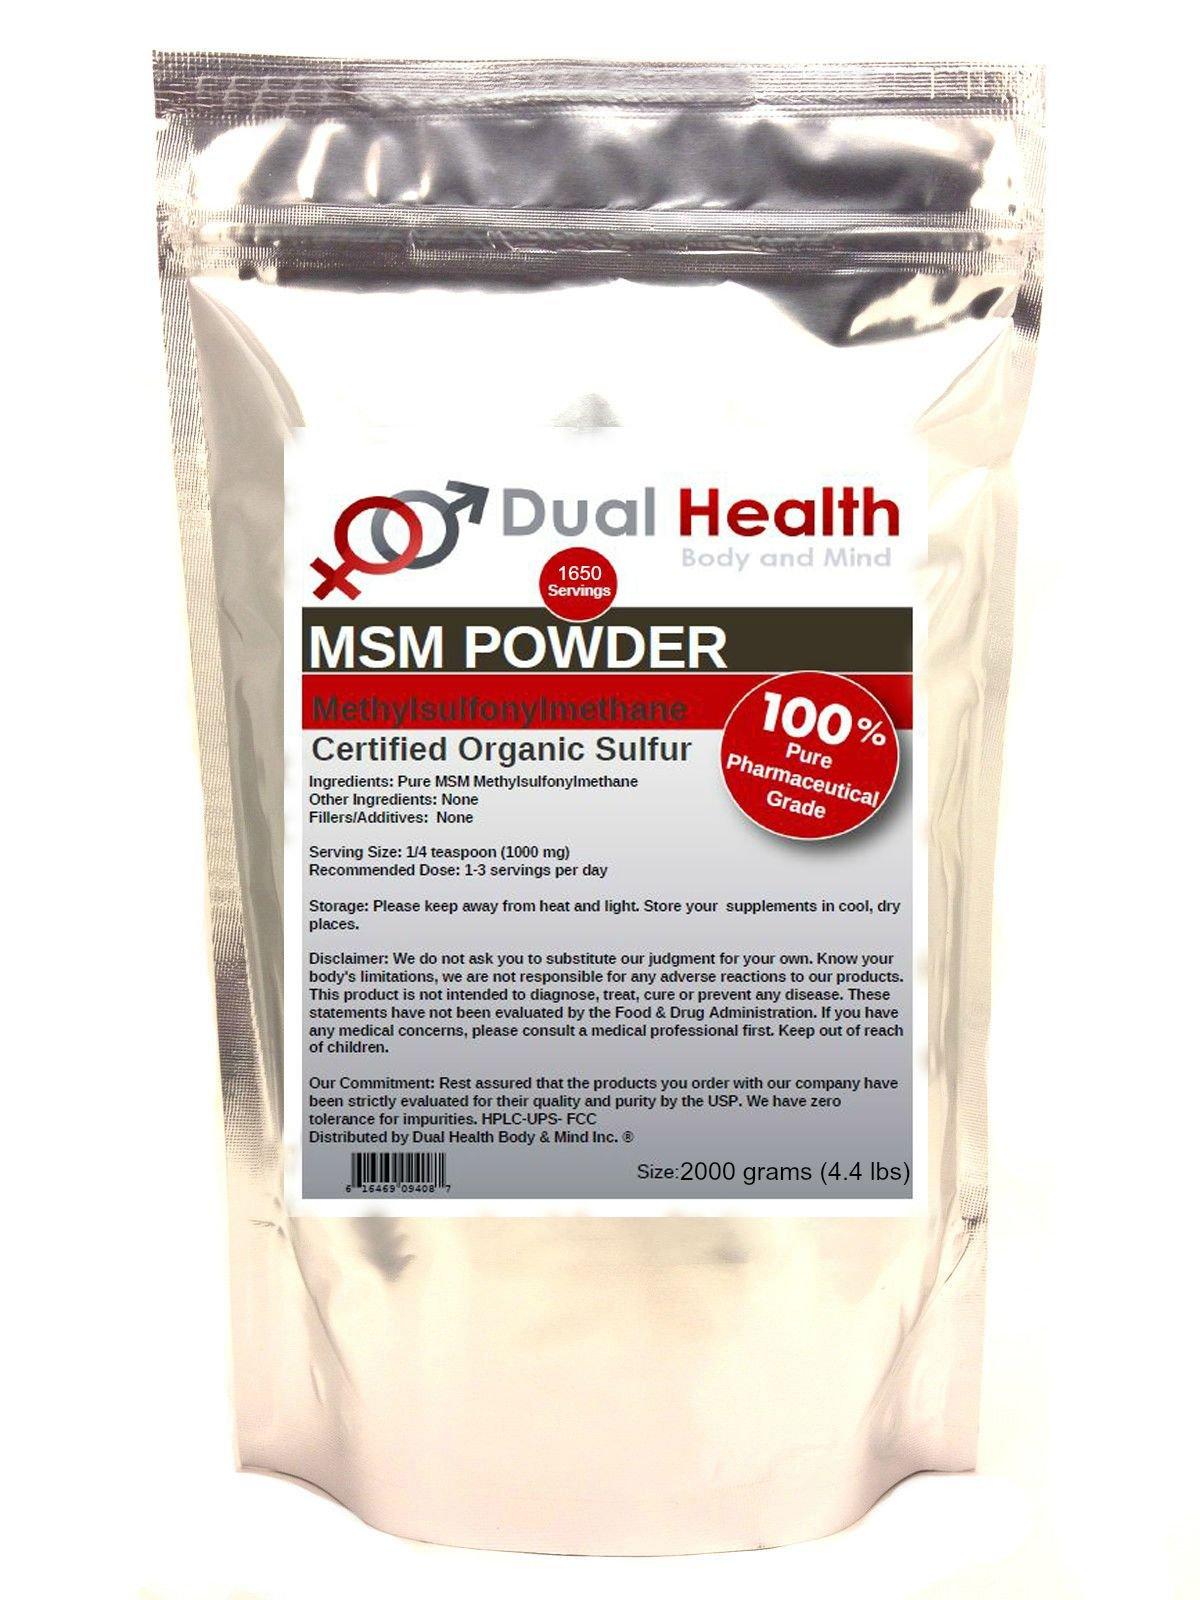 Pure MSM Methylsulfonylmethane Powder (2000g / 4.4 lb) Bulk Supplements